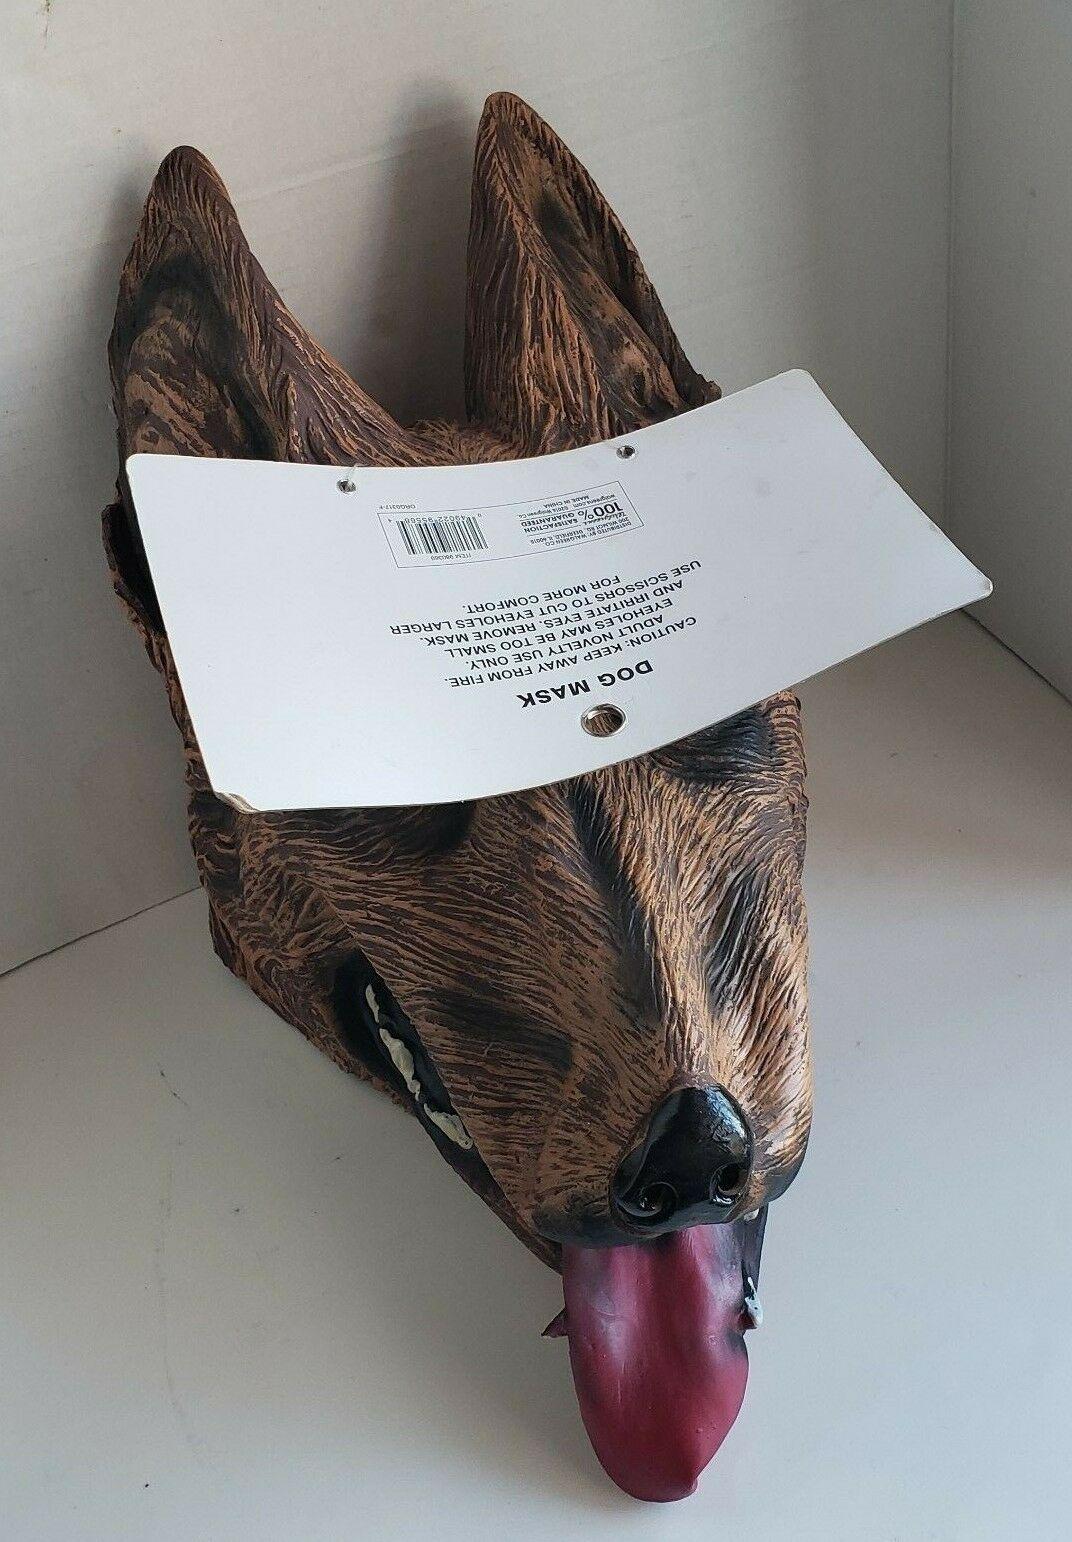 Dog Face Mask Shepherd Pranks Dress Up Adult Costume Halloween Rubber One Size